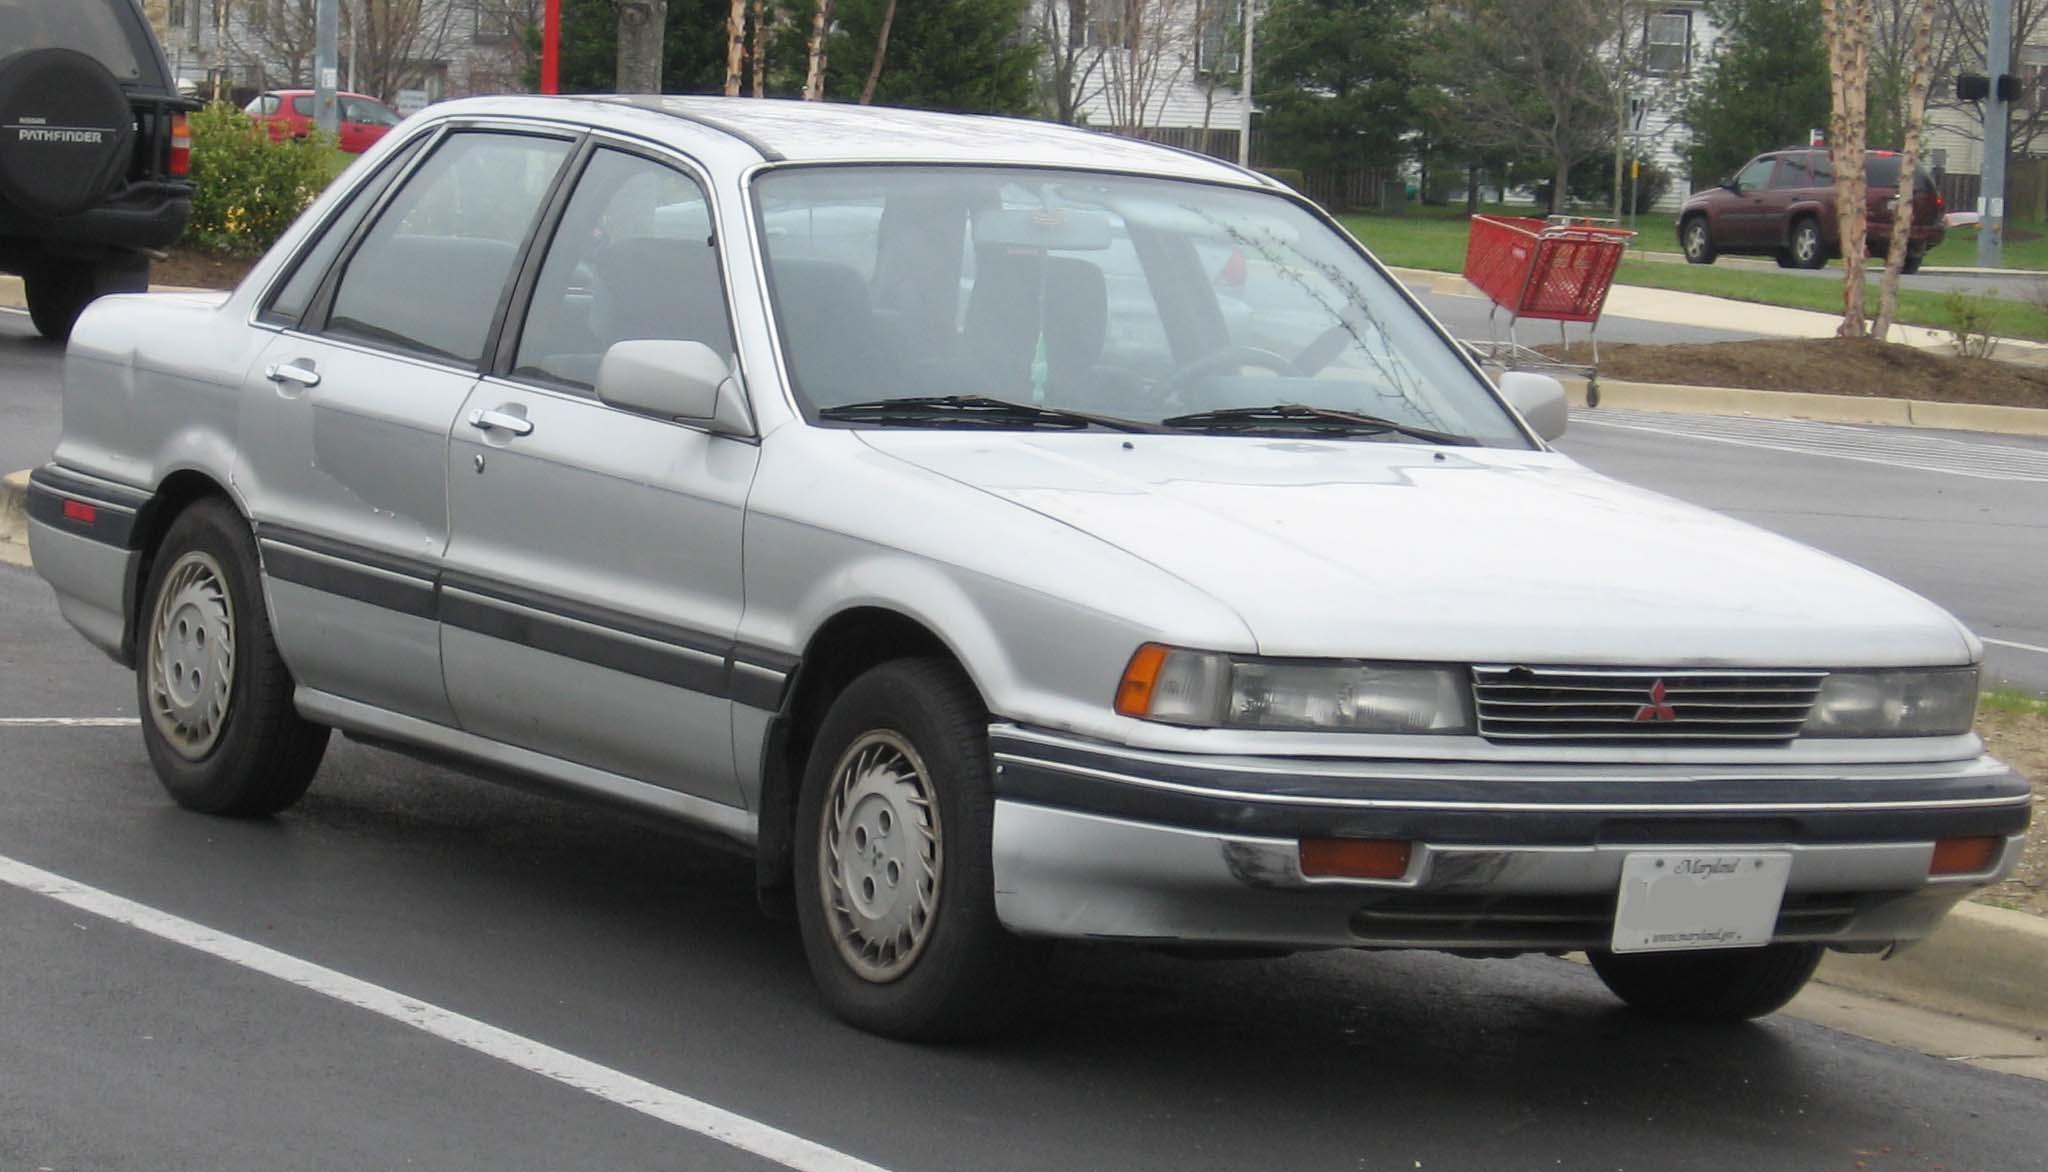 File:6th-Mitsubishi-Galant.jpg - Wikimedia Commons